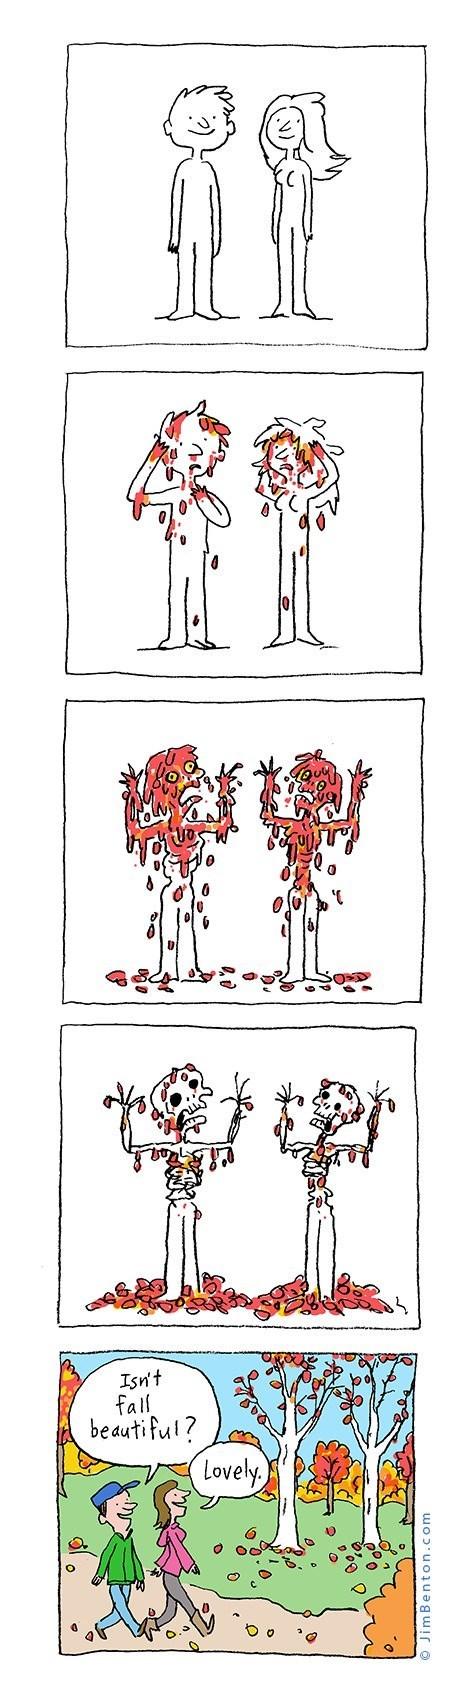 funny-web-comics-the-beautiful-cruelty-of-nature